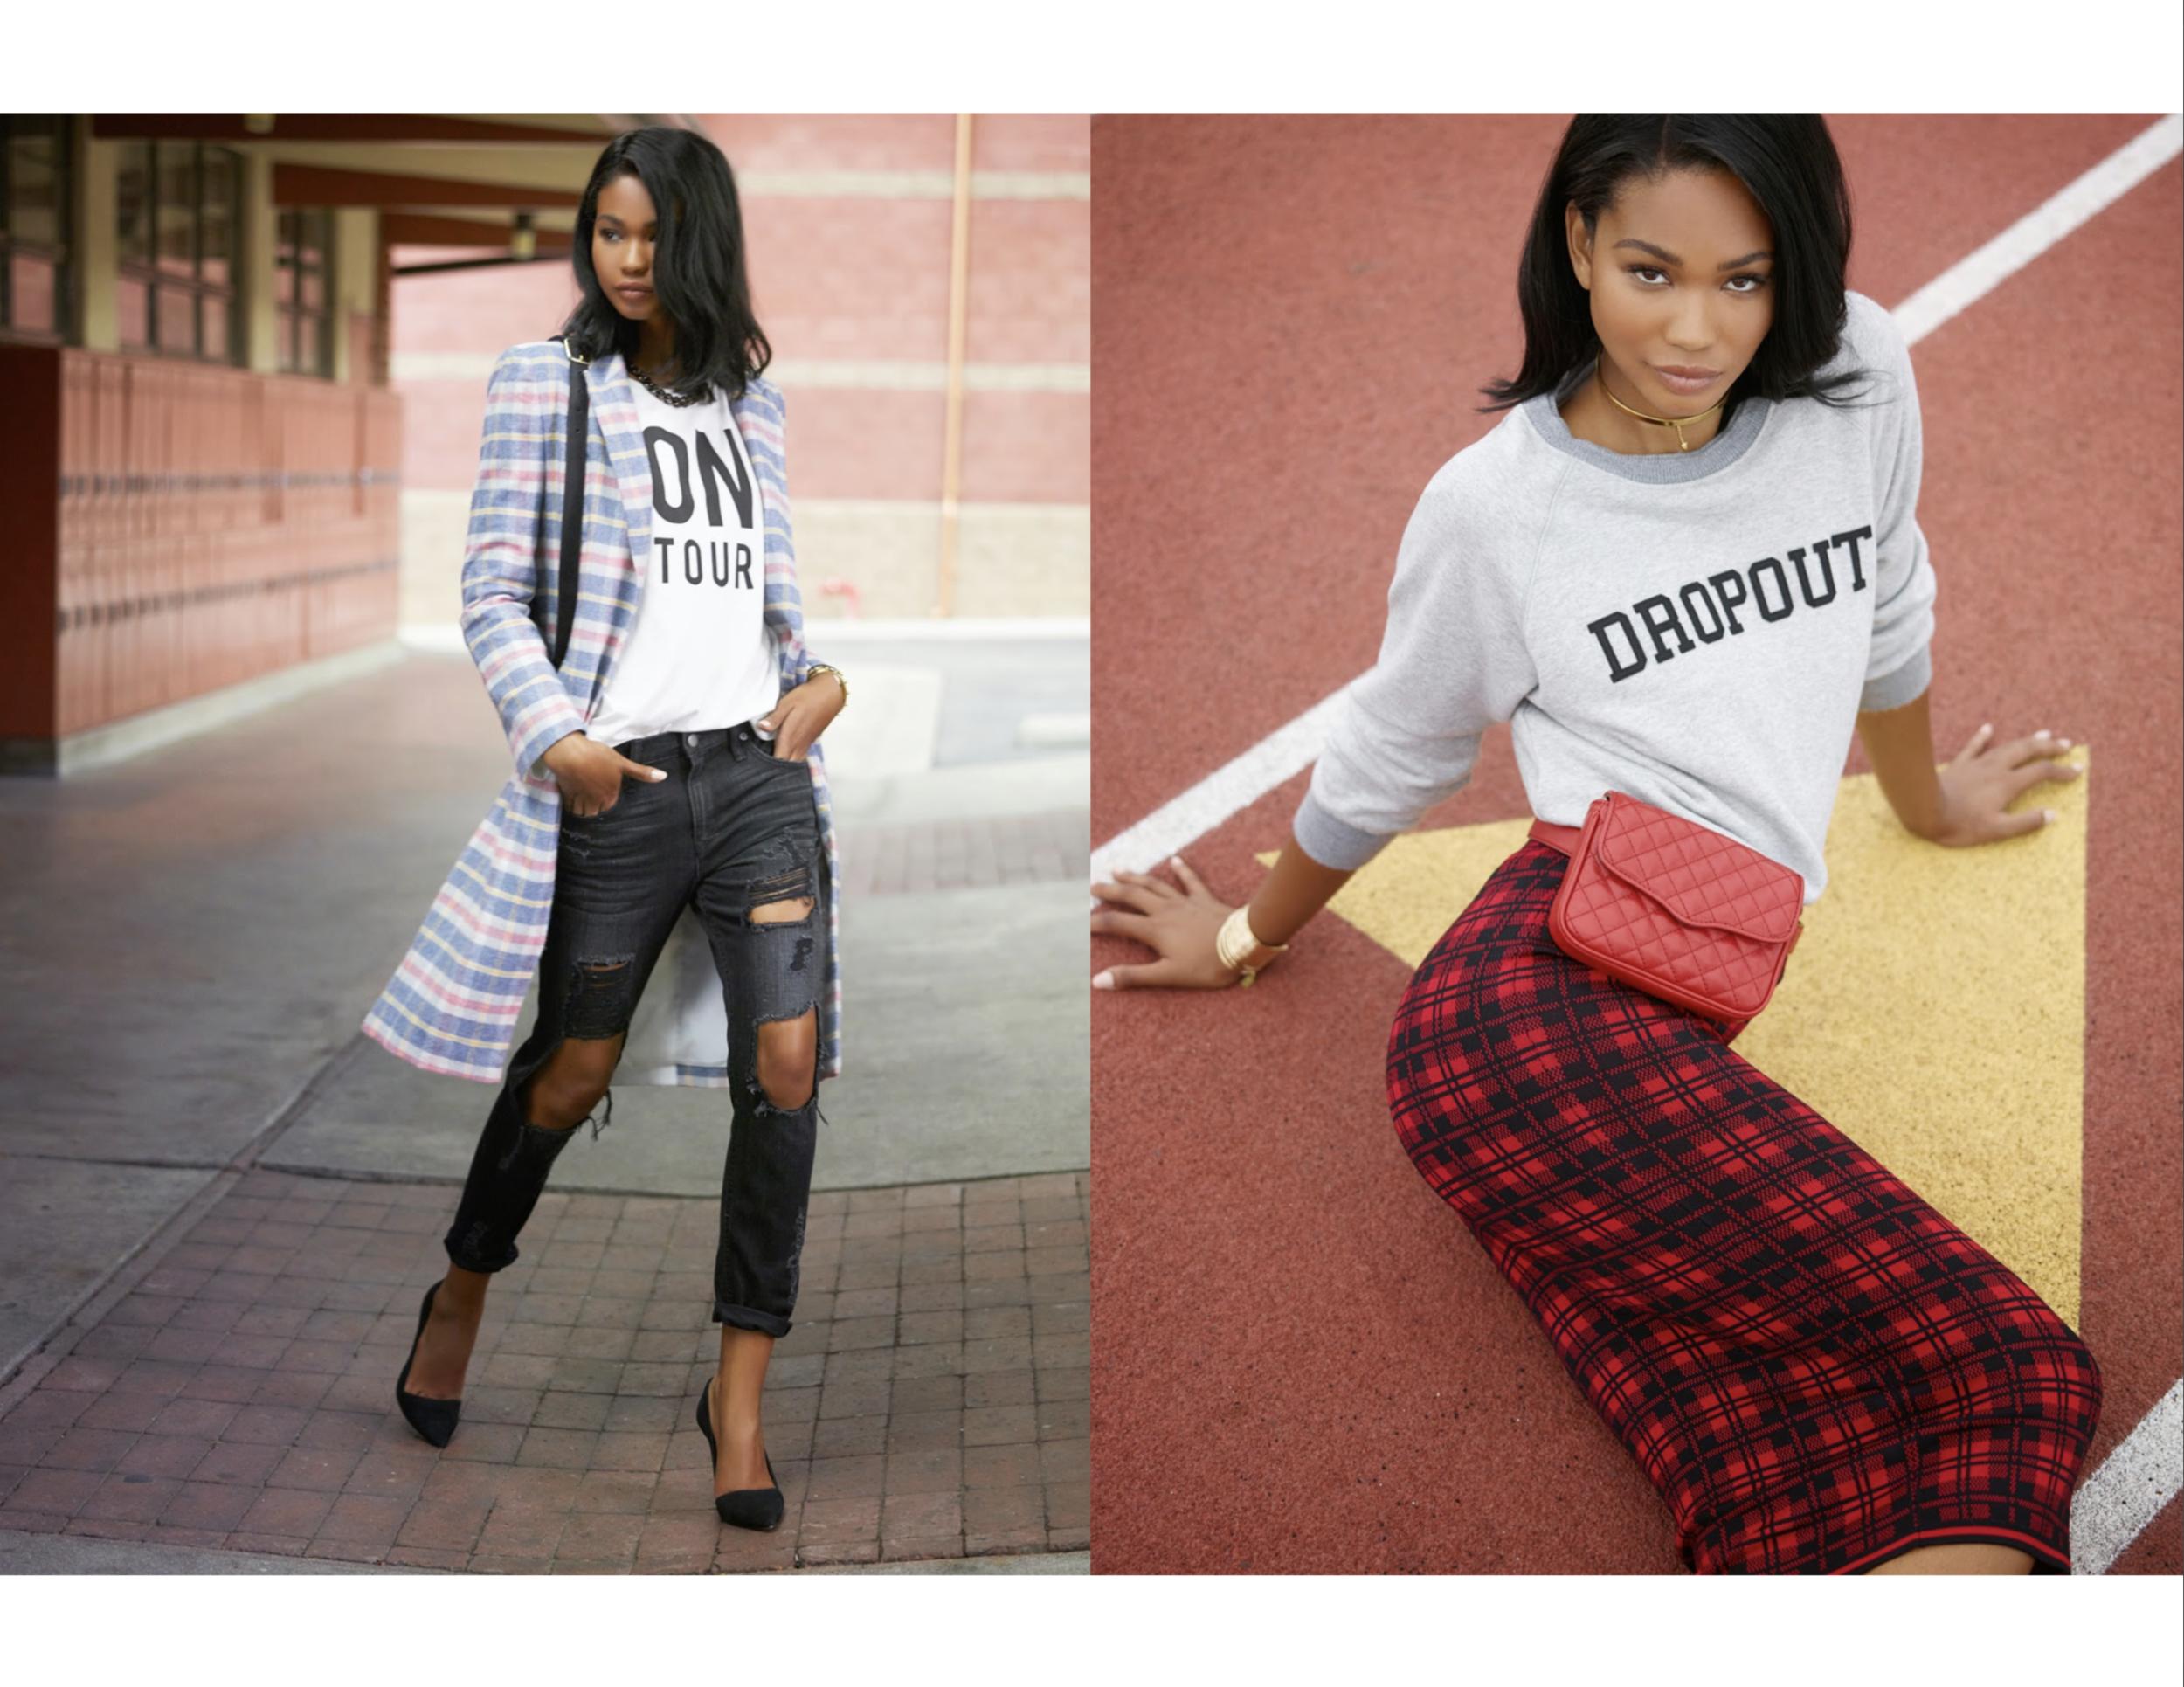 Chanel Iman - Revolve Clothing